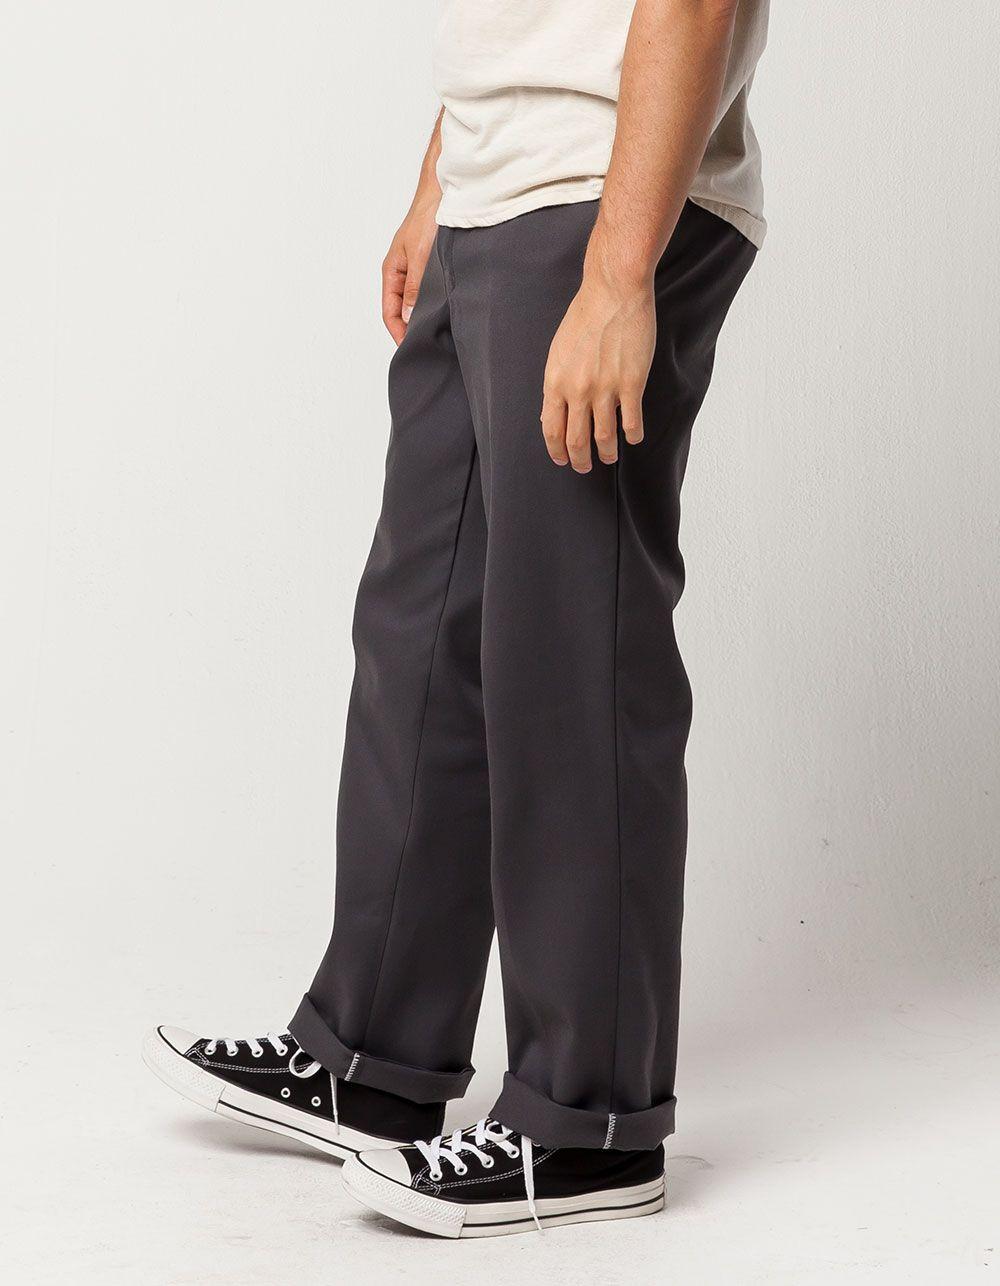 Dickies 874 flex original fit mens pants charc